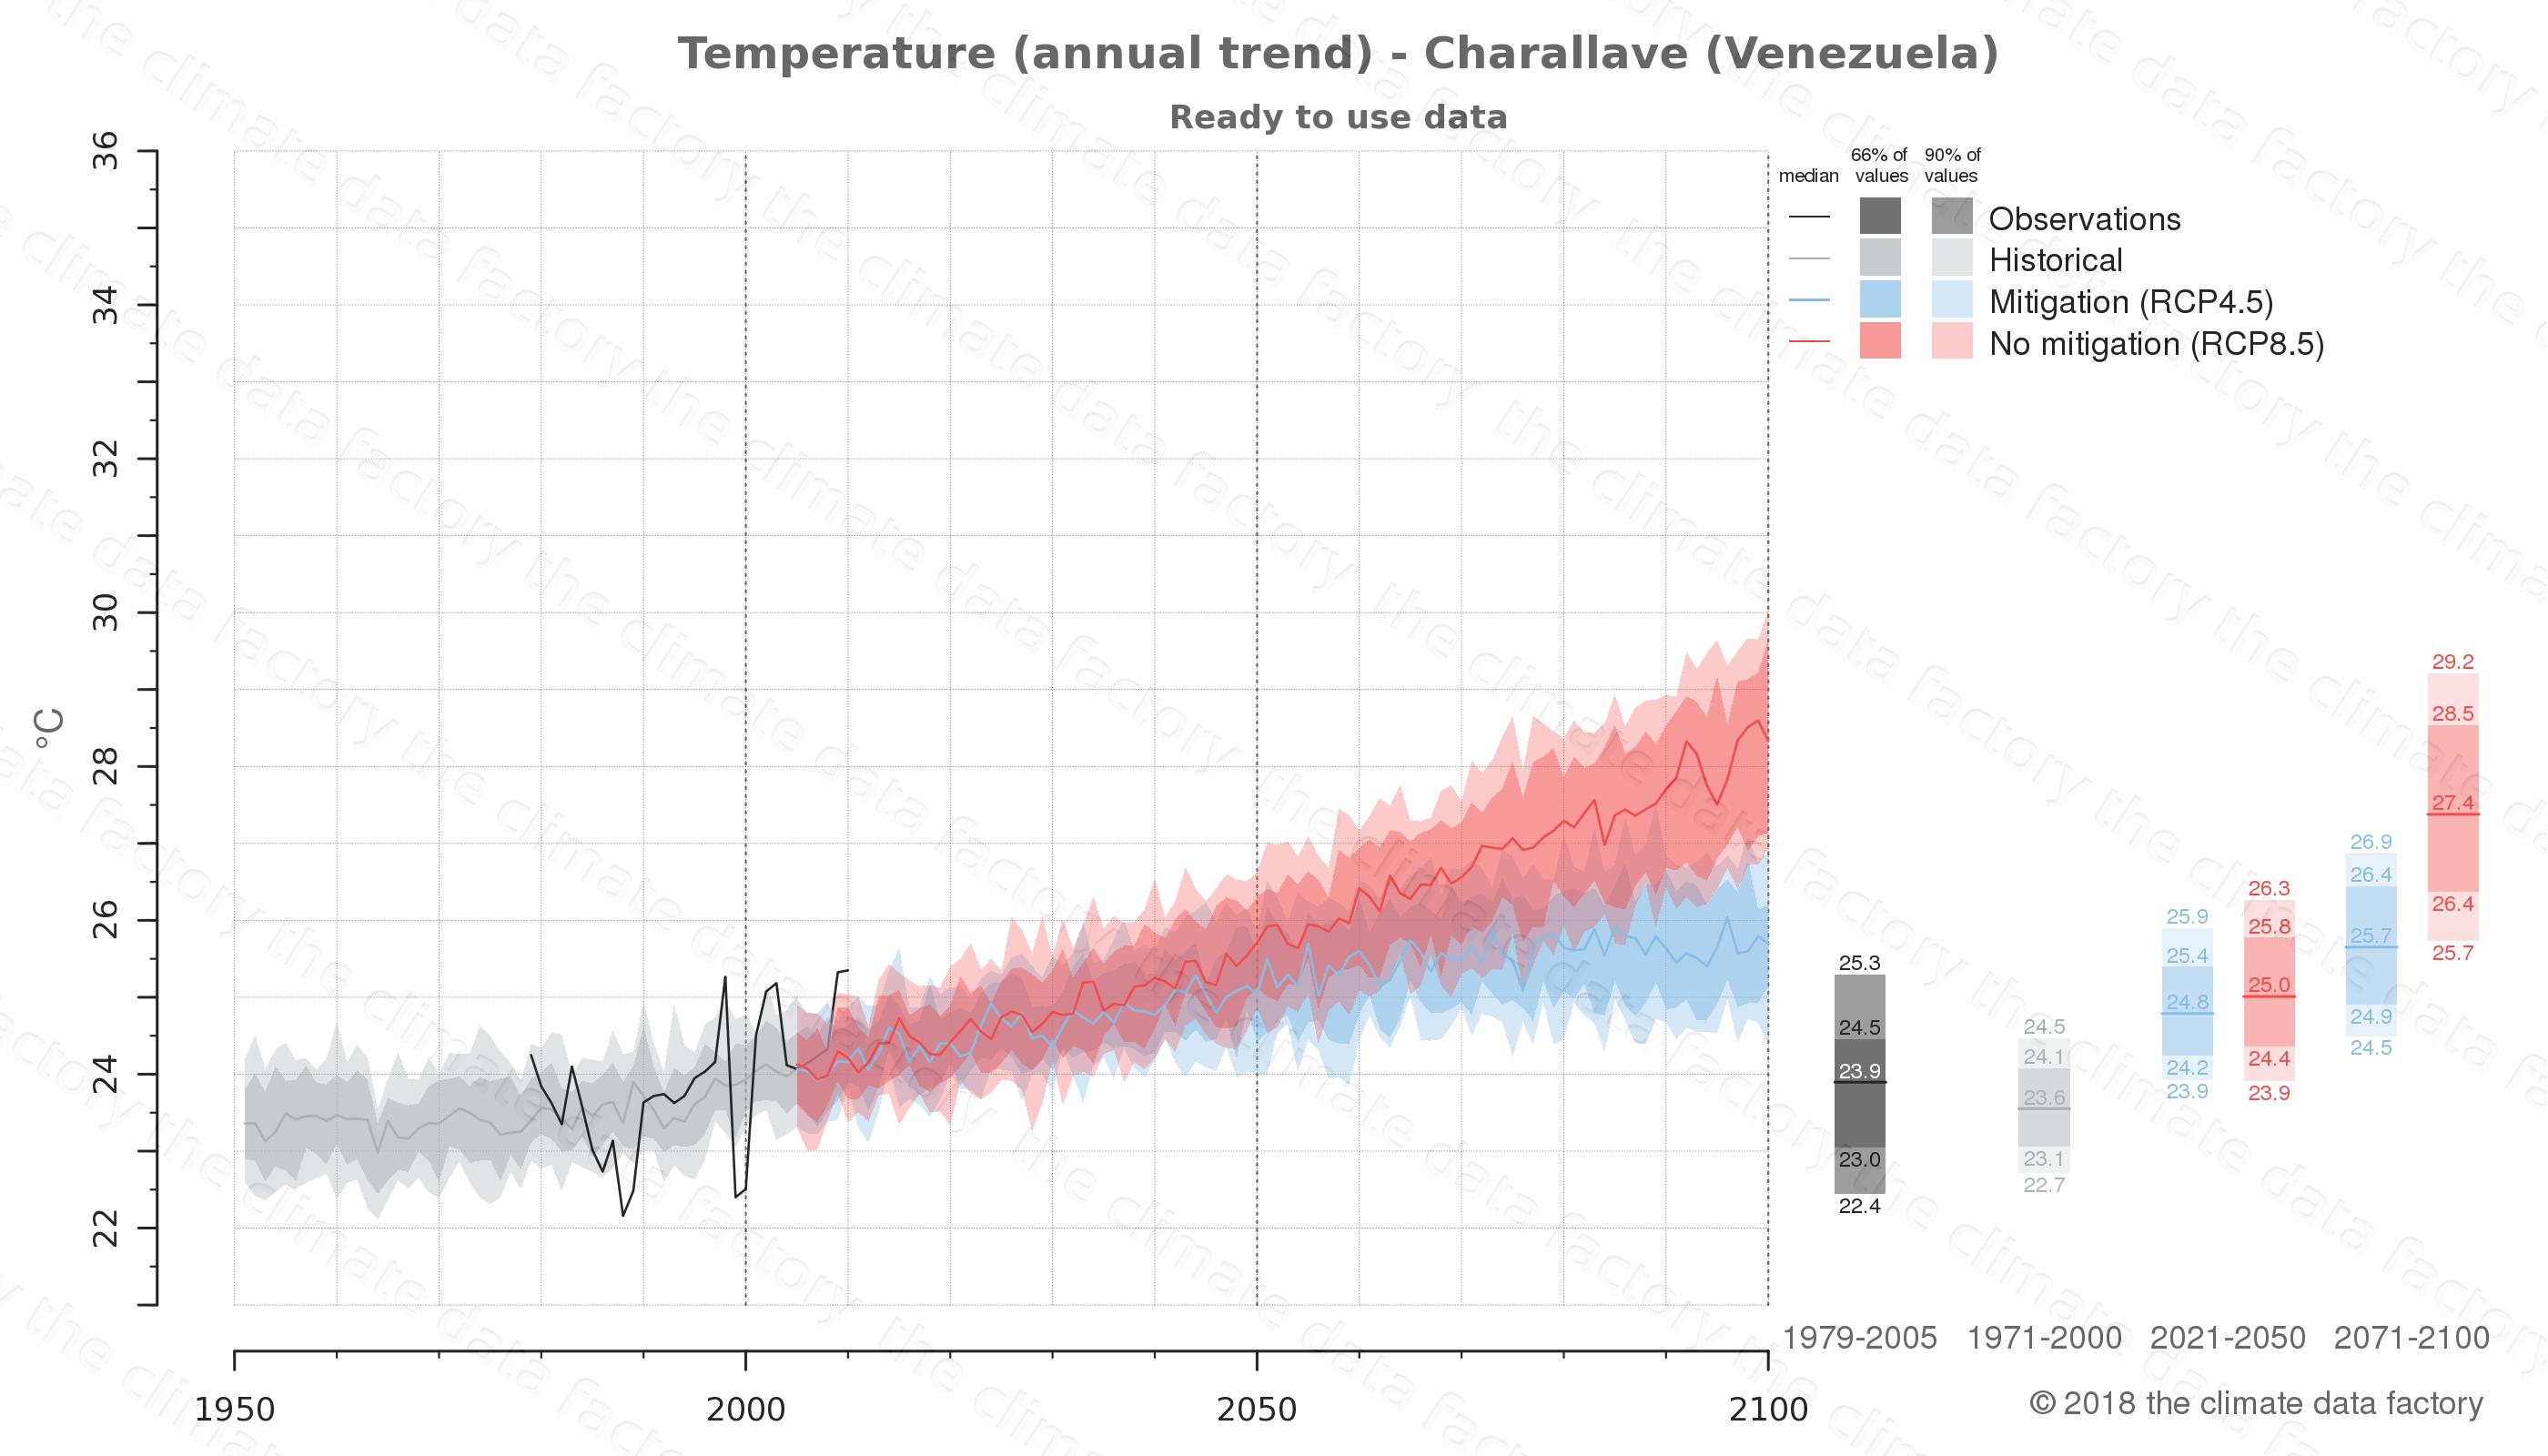 climate change data policy adaptation climate graph city data temperature charallave venezuela